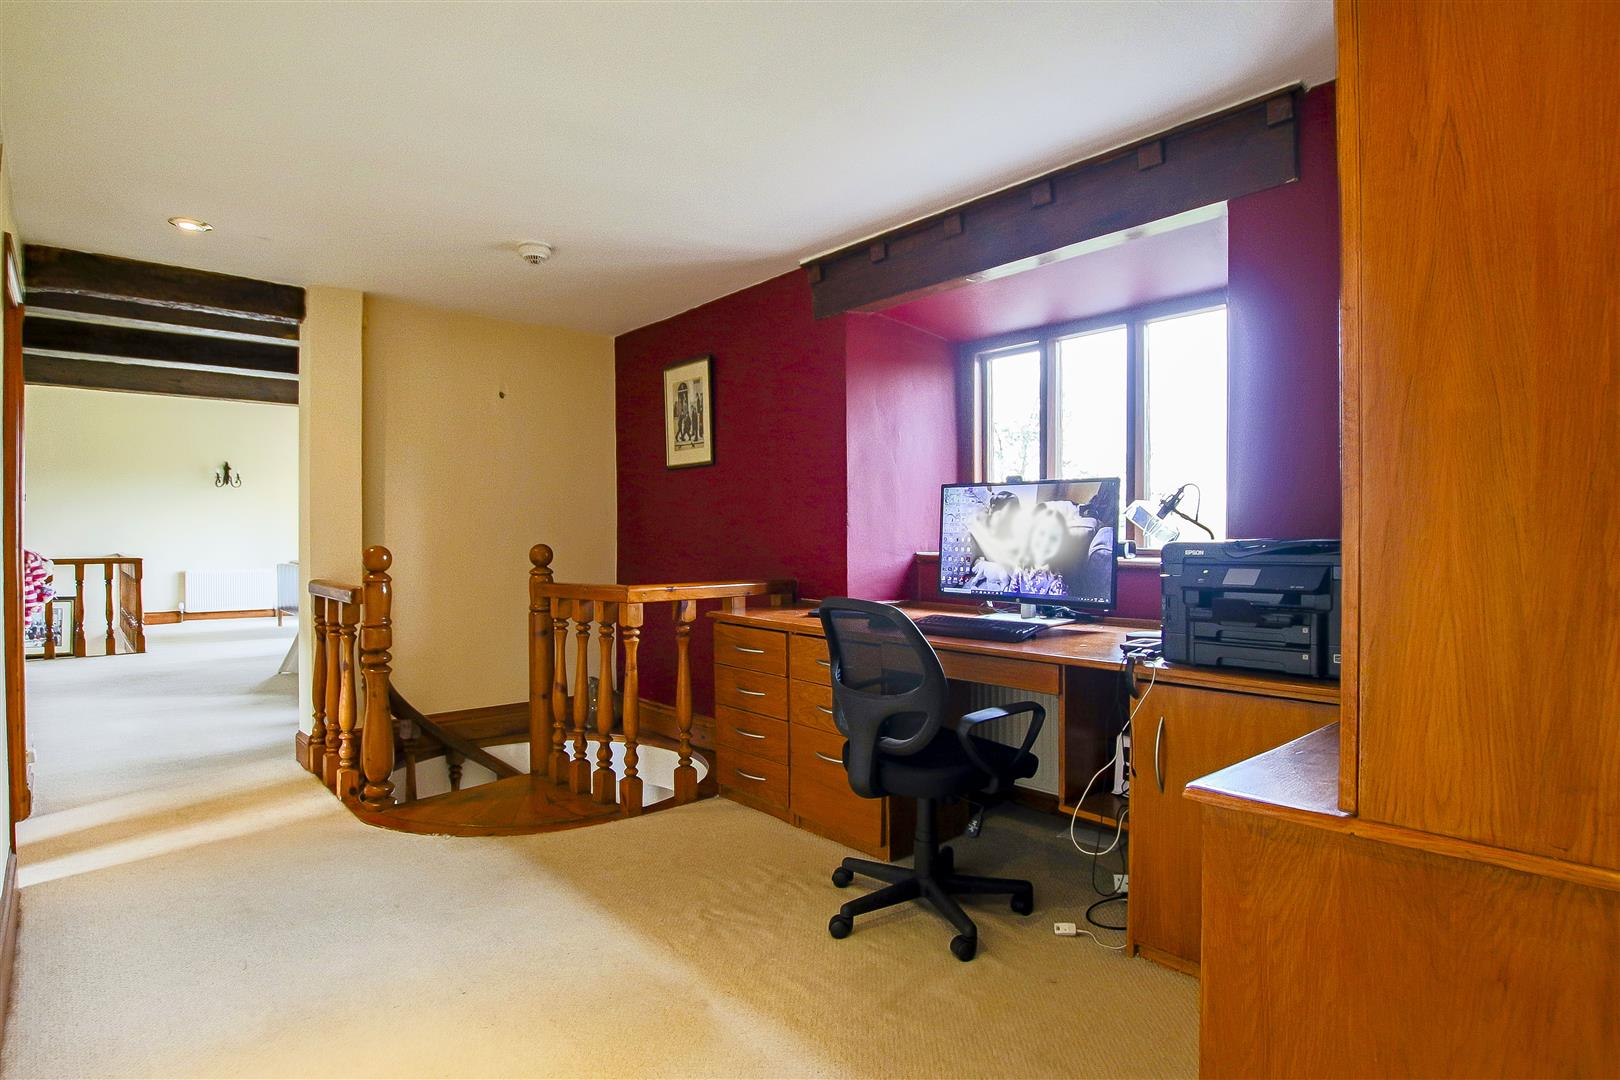 5 Bedroom Barn Conversion For Sale - 6.jpg